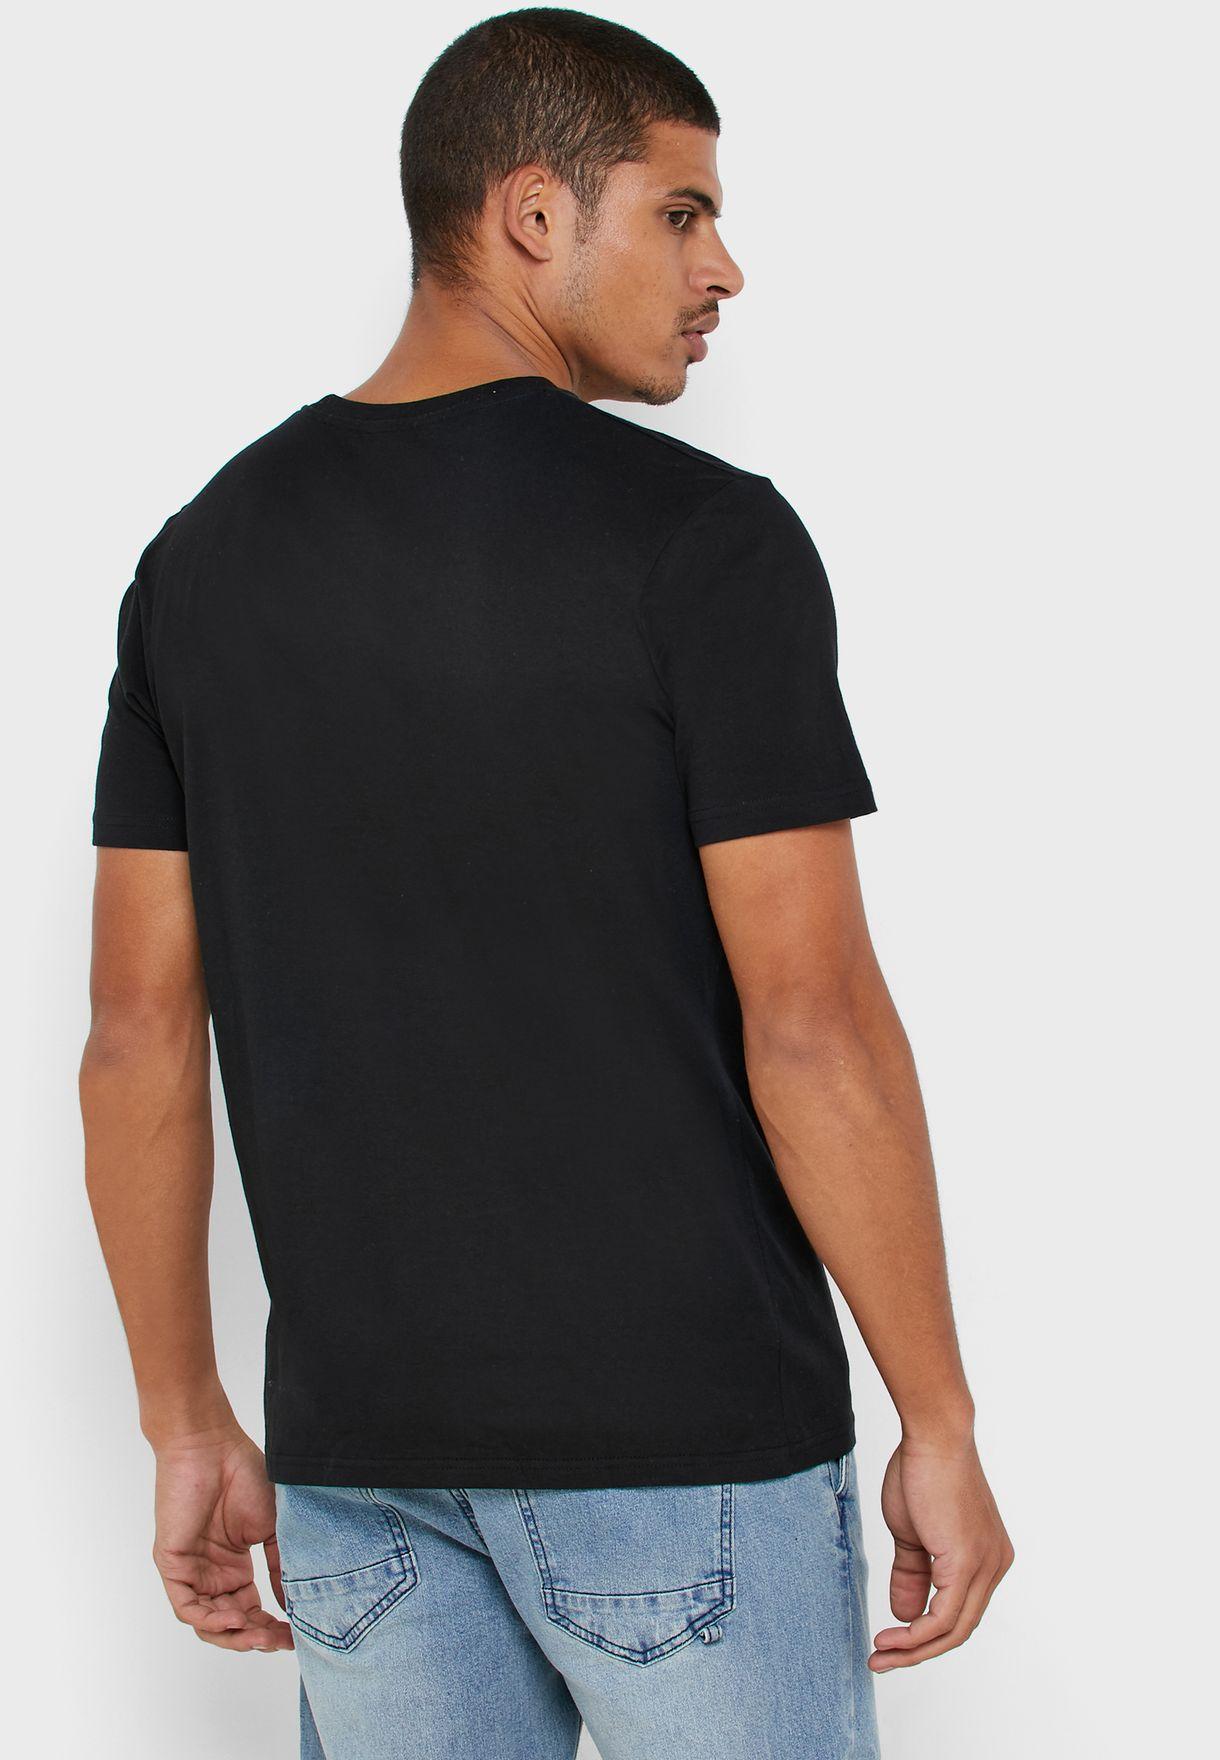 Collective Chaos Crew Neck T-Shirt